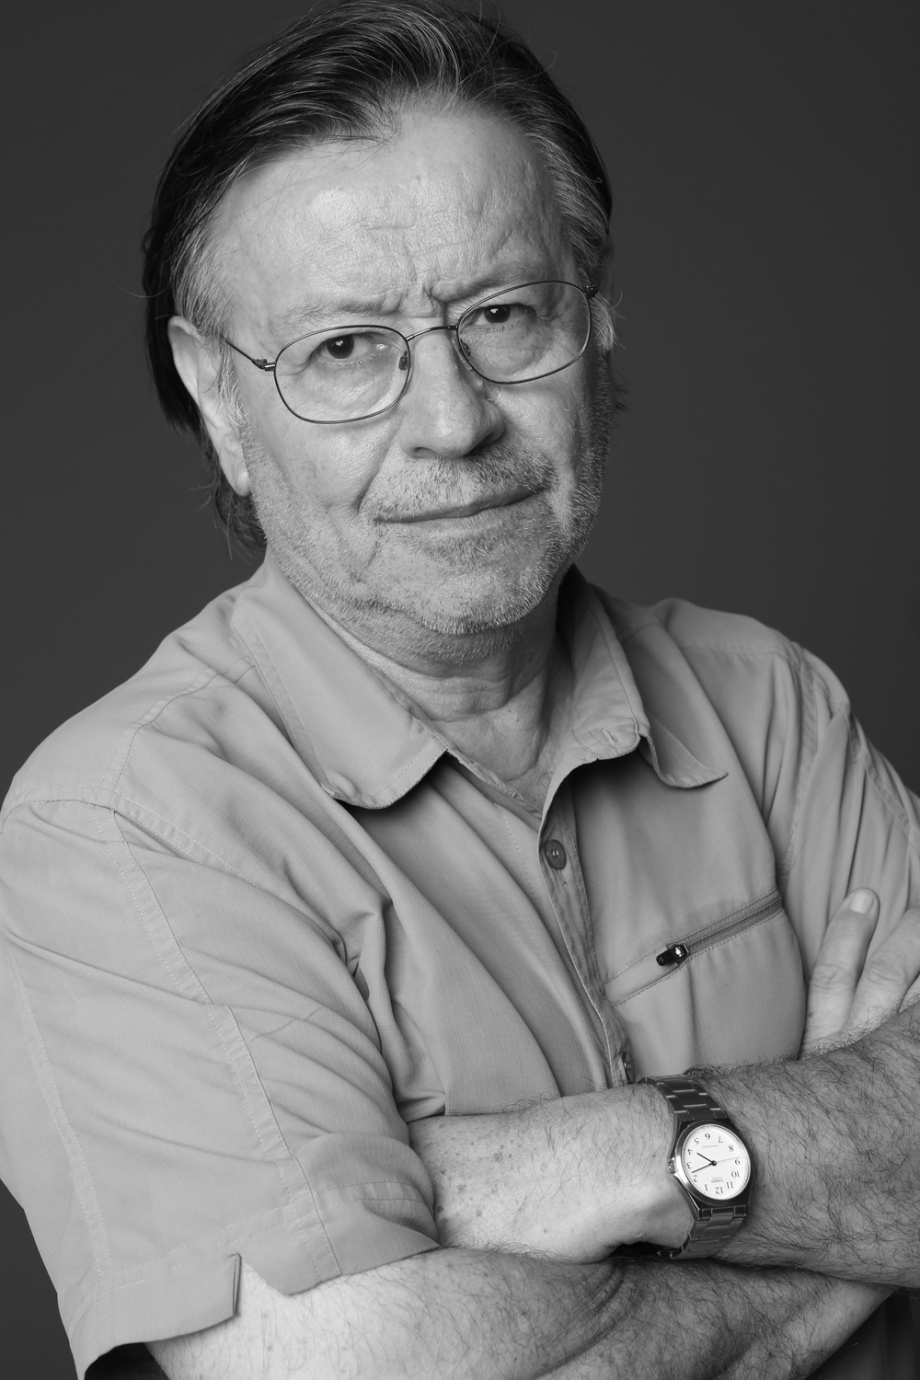 Orlando Lubbert